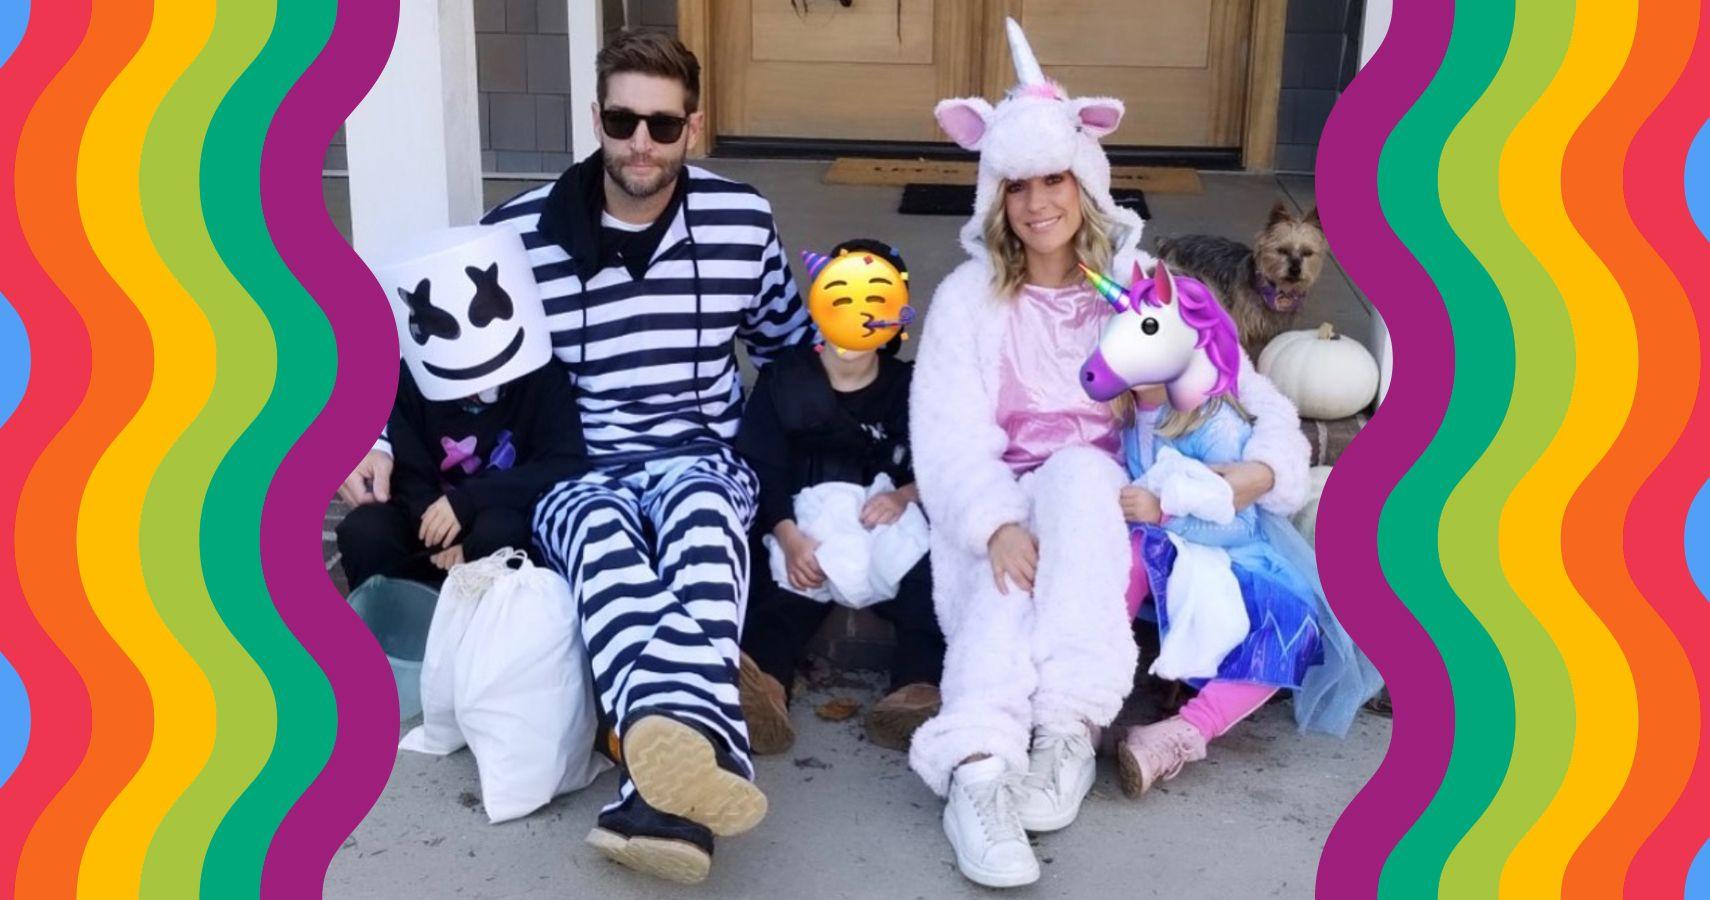 Kristin Cavallari & Jay Cutler Spend Halloween Together